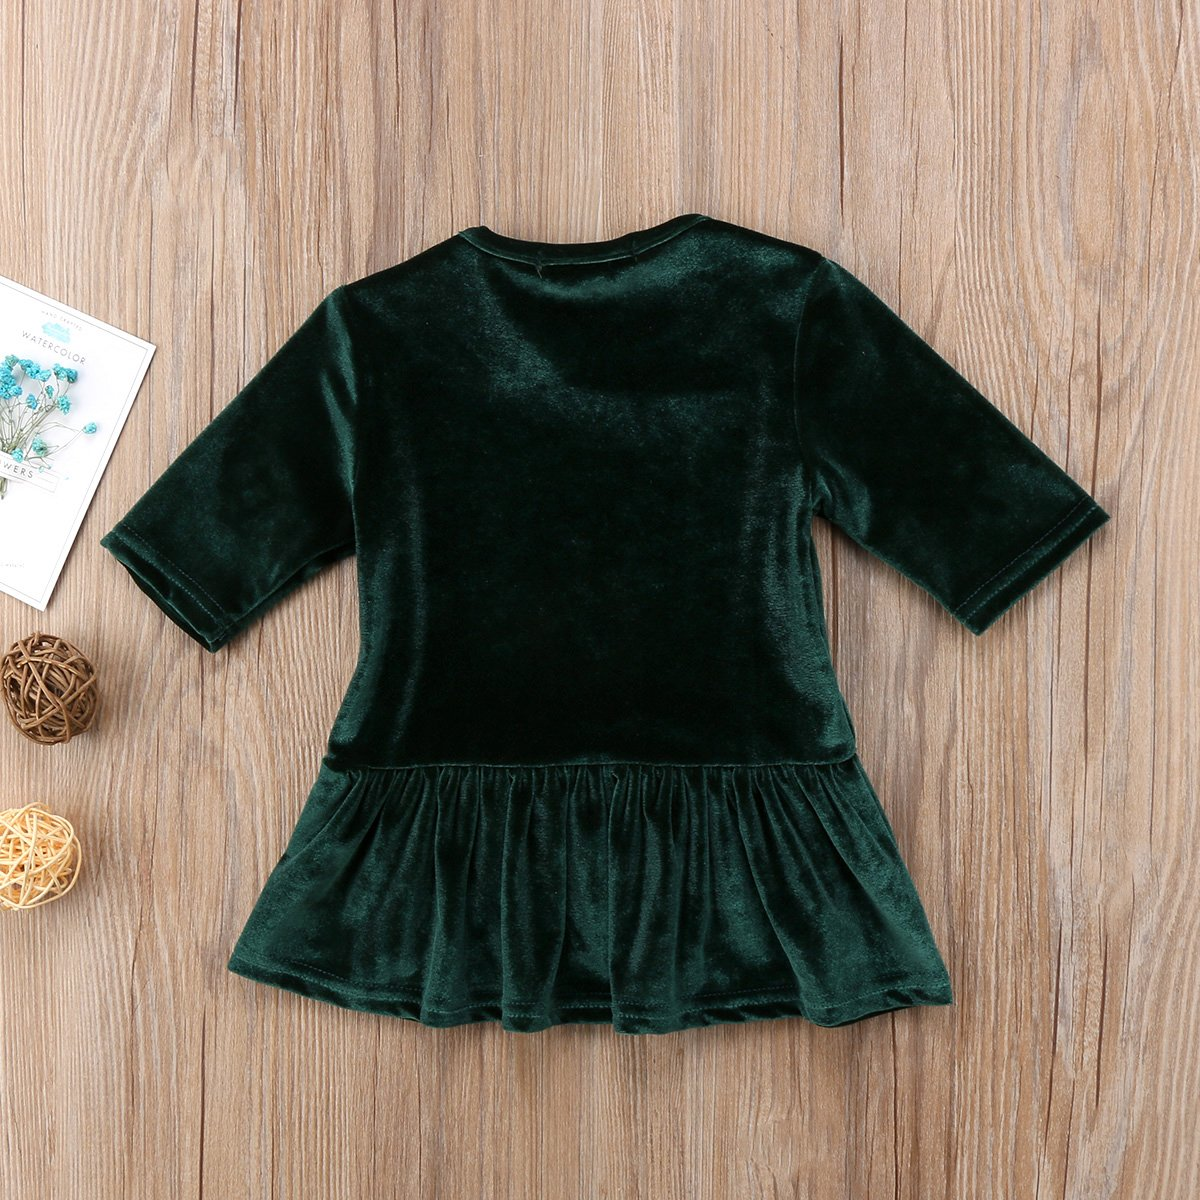 84a67171f21a Amazon.com  Canis Kids Baby Girls Vintage Style Half Sleeve Velvet ...